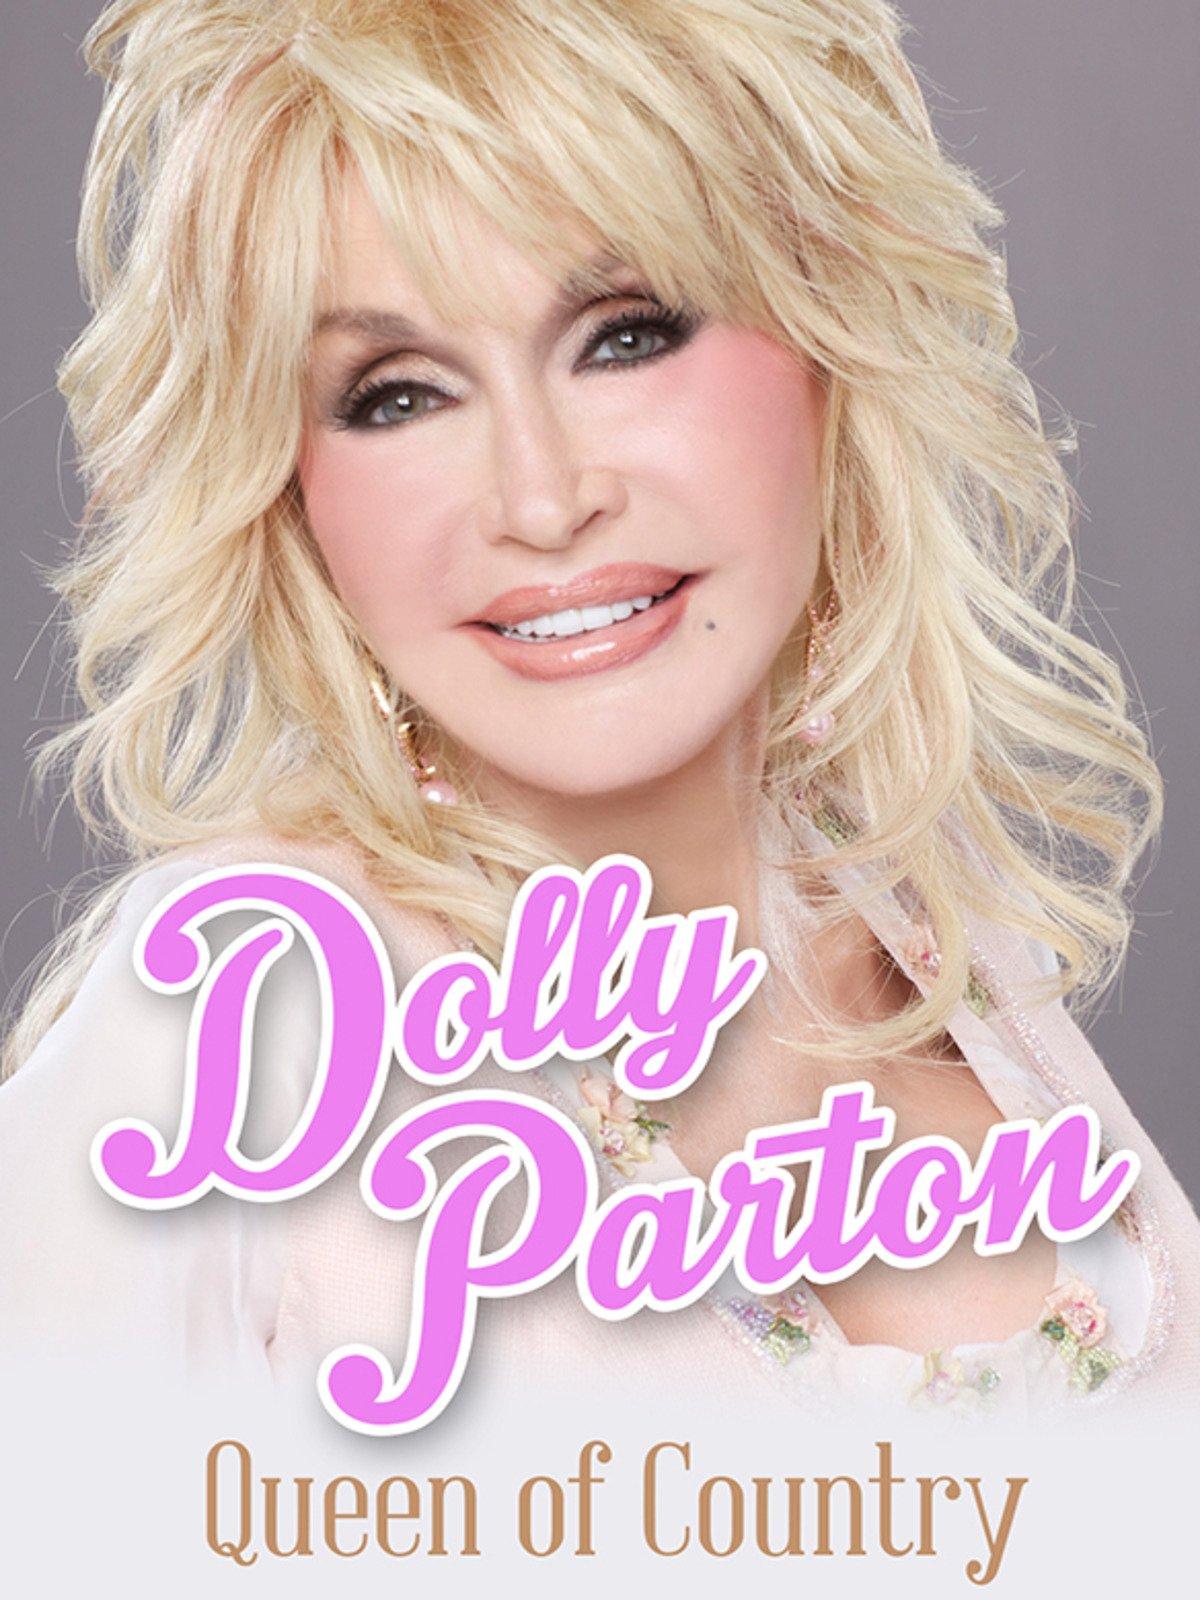 Dolly Parton: Queen of Country